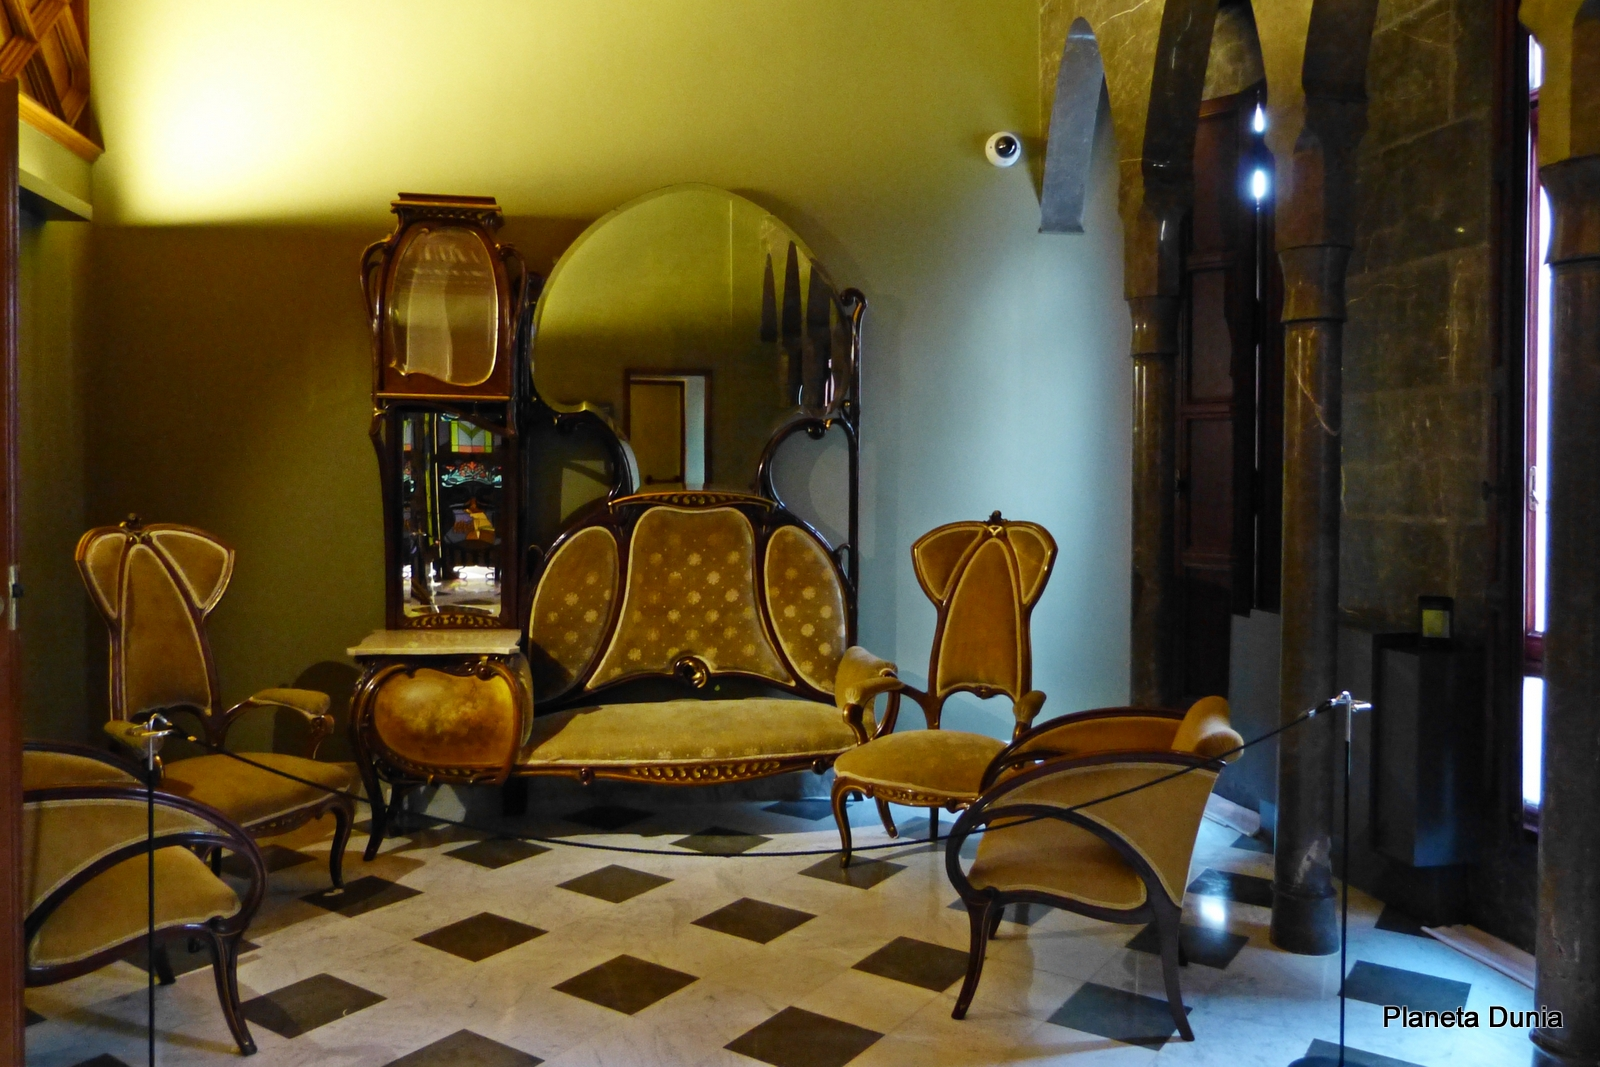 Planeta dunia el palau g ell de antoni gaud barcelona for Gaudi muebles